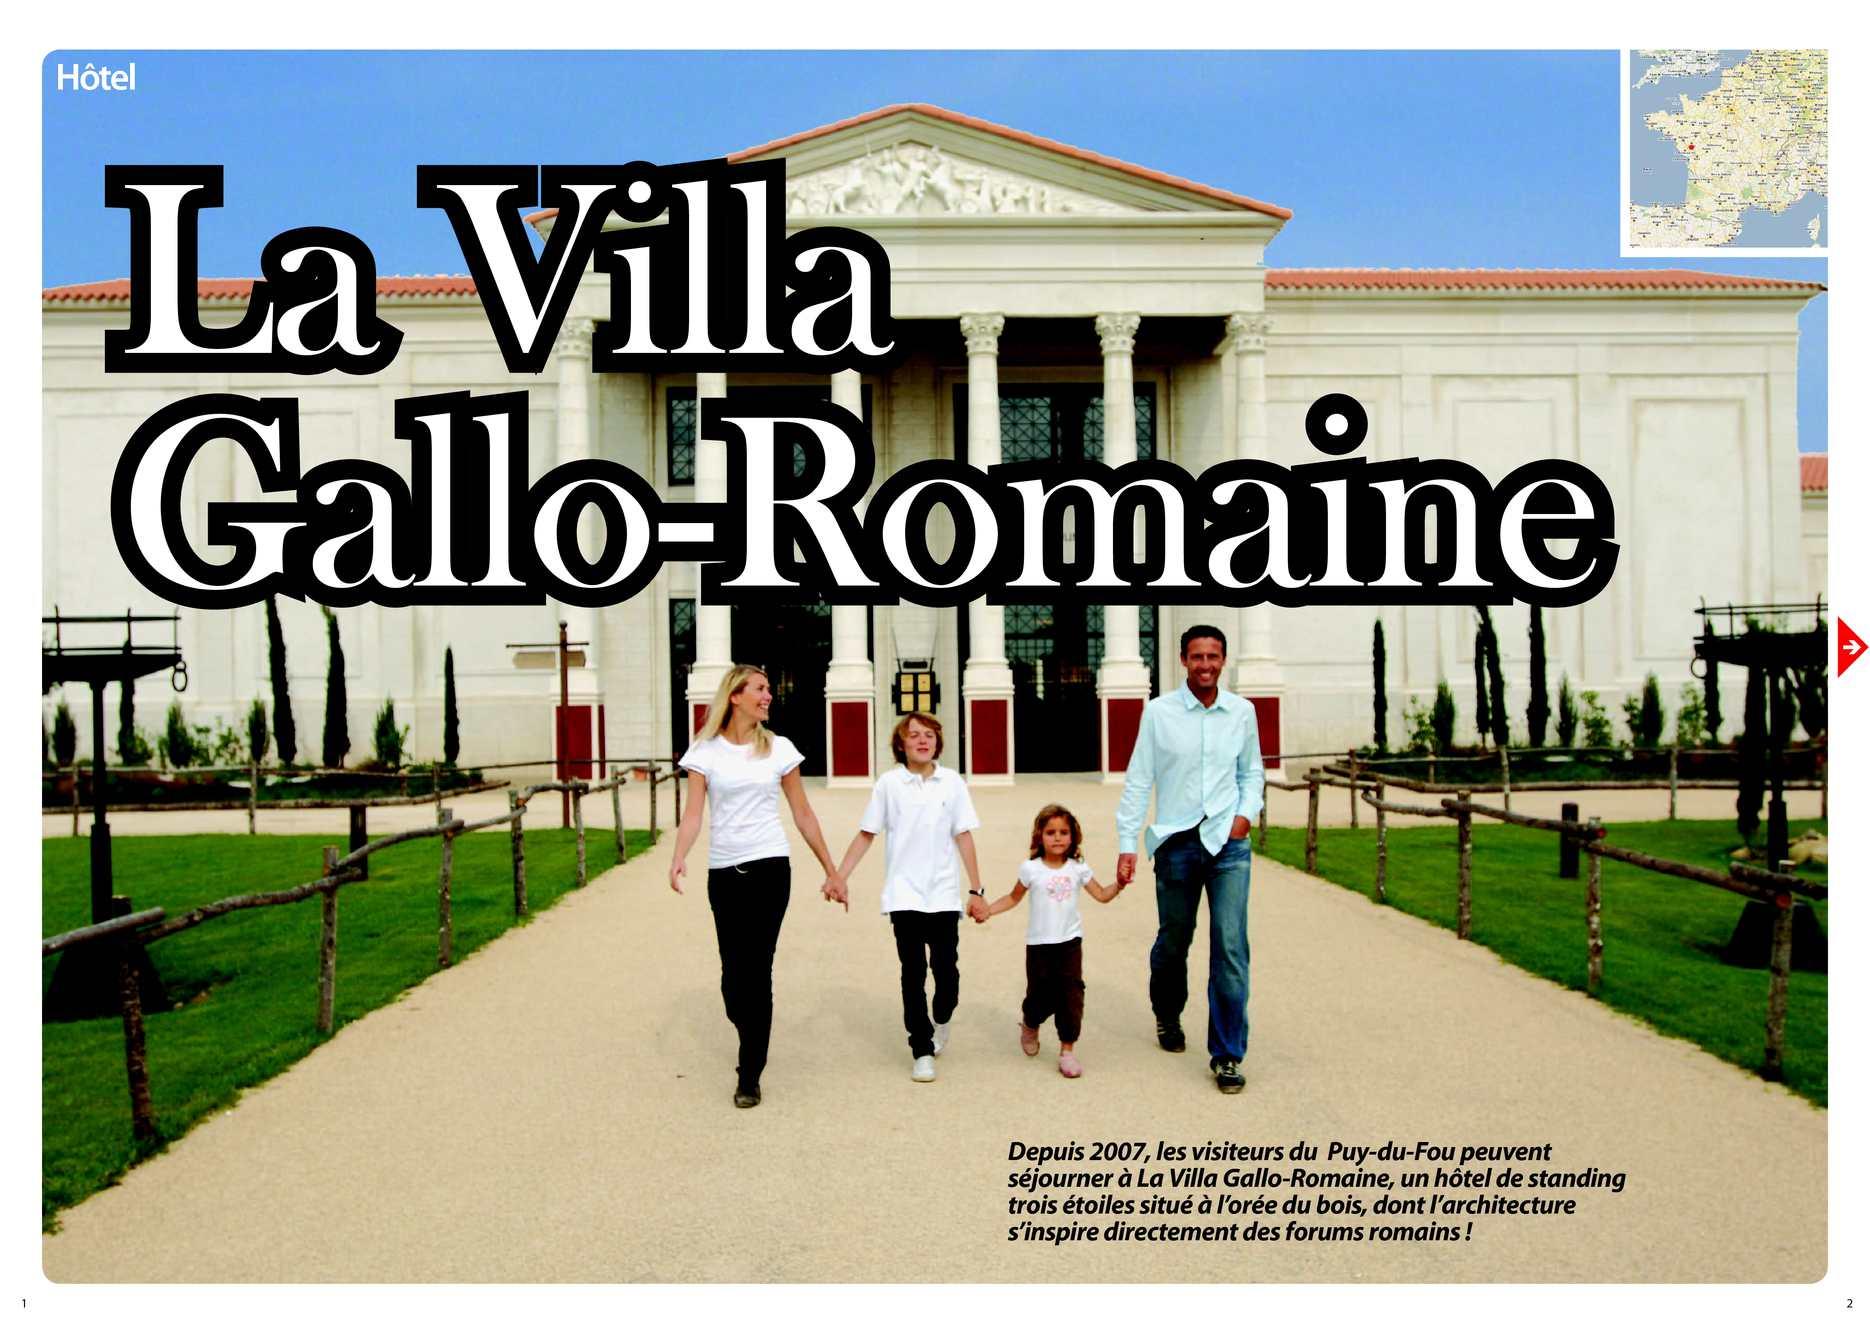 calam o h tel villa gallo romaine au puy du fou. Black Bedroom Furniture Sets. Home Design Ideas